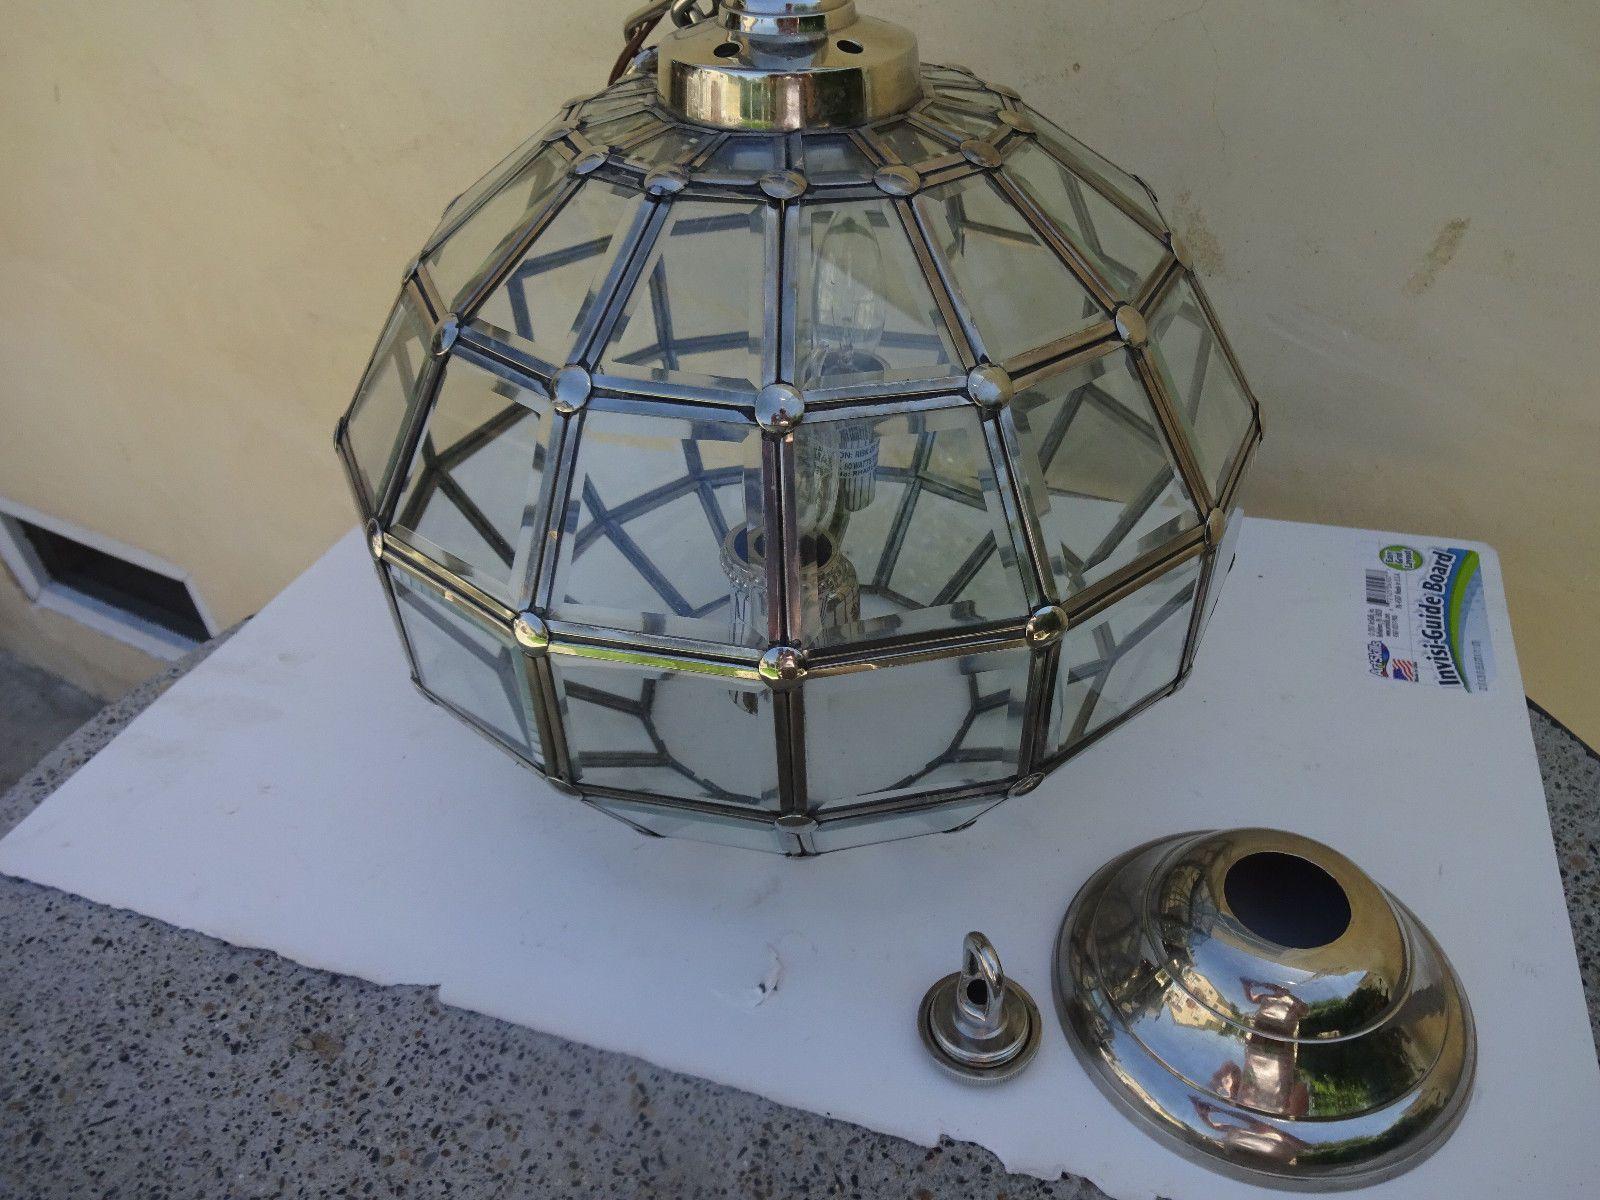 Restoration hardware cut glass pendant glass lamp light fixture